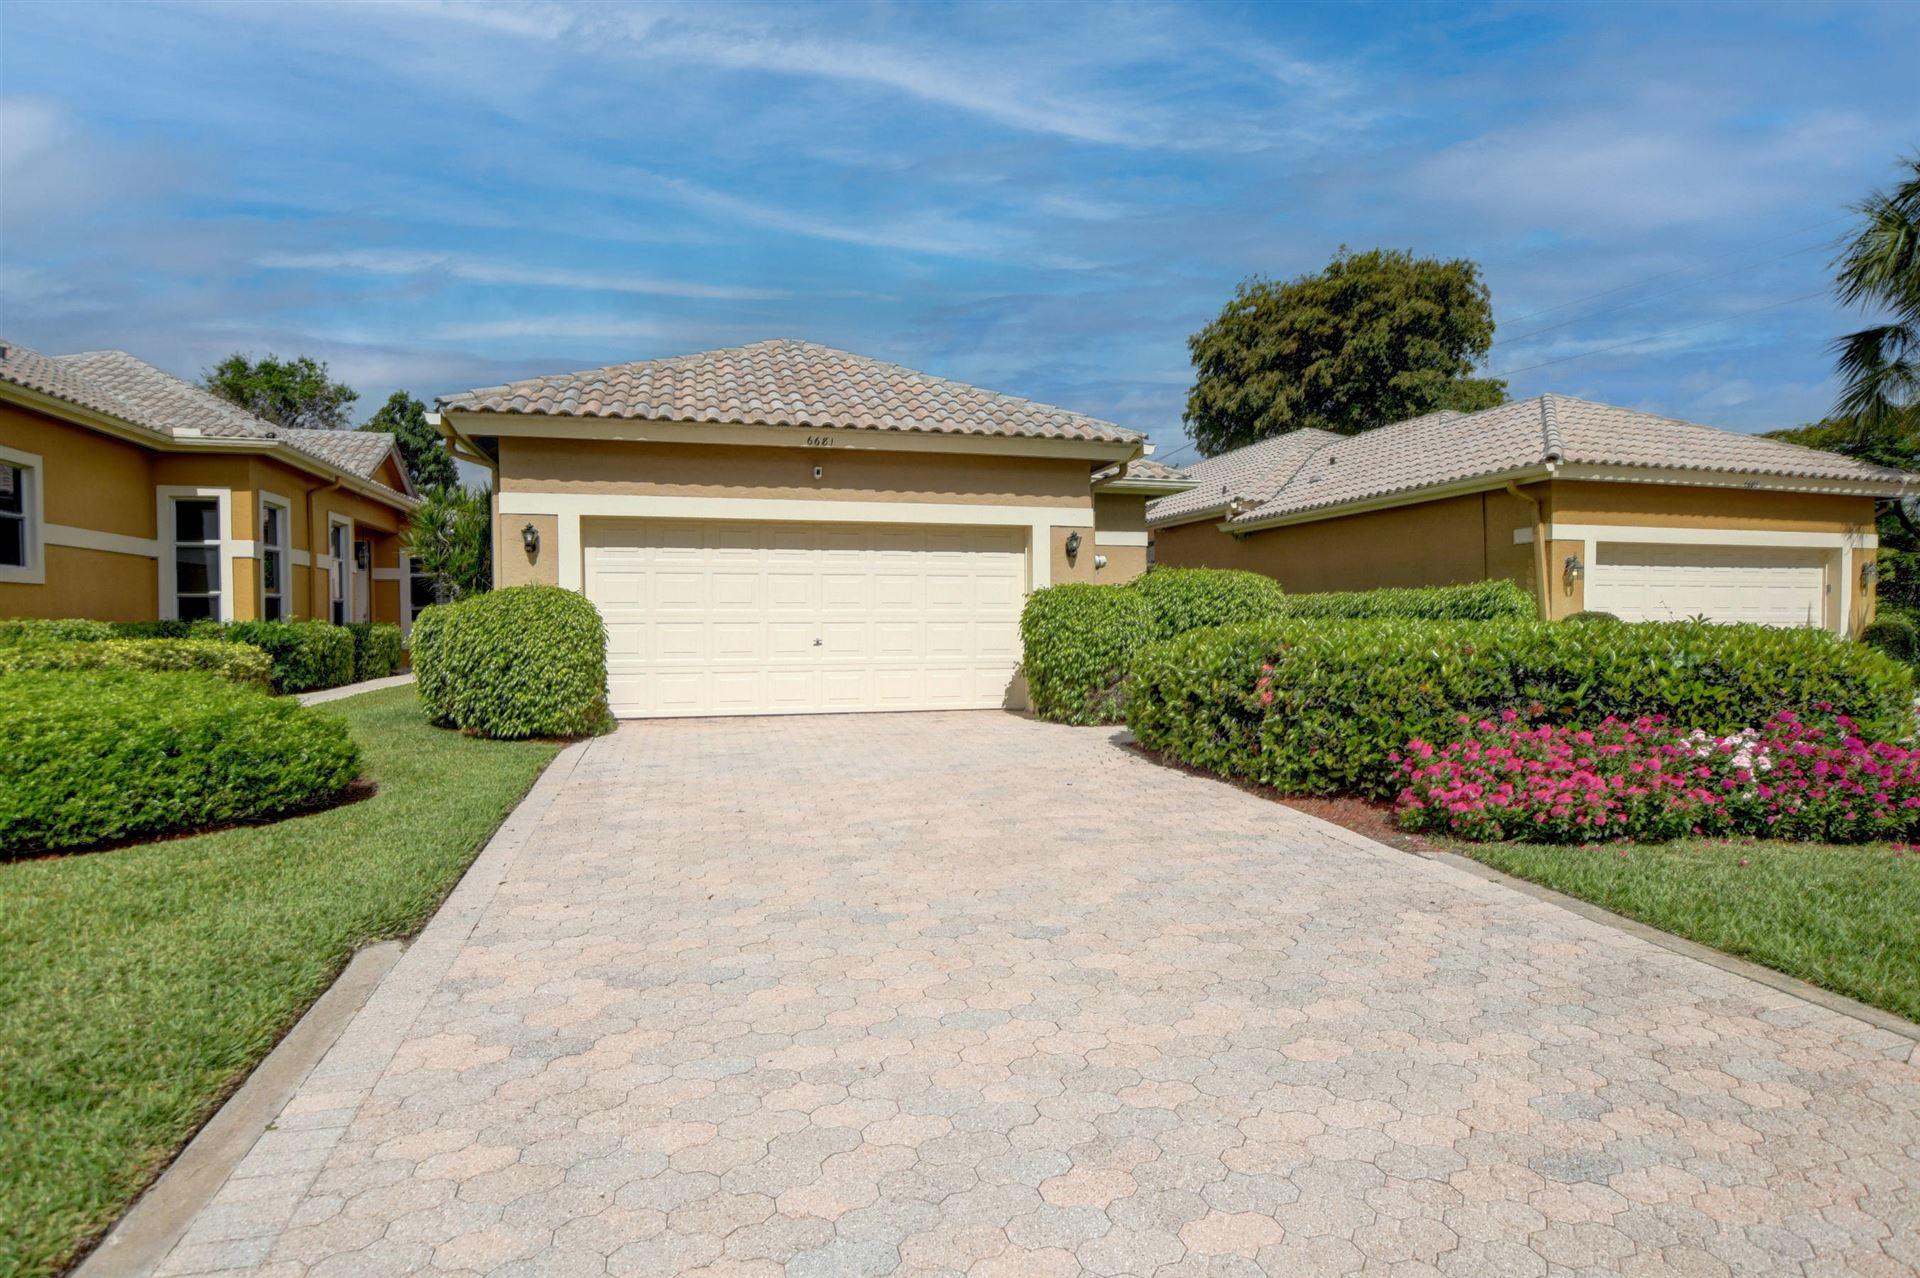 6681 NW 25th Terrace, Boca Raton, FL 33496 - #: RX-10727858